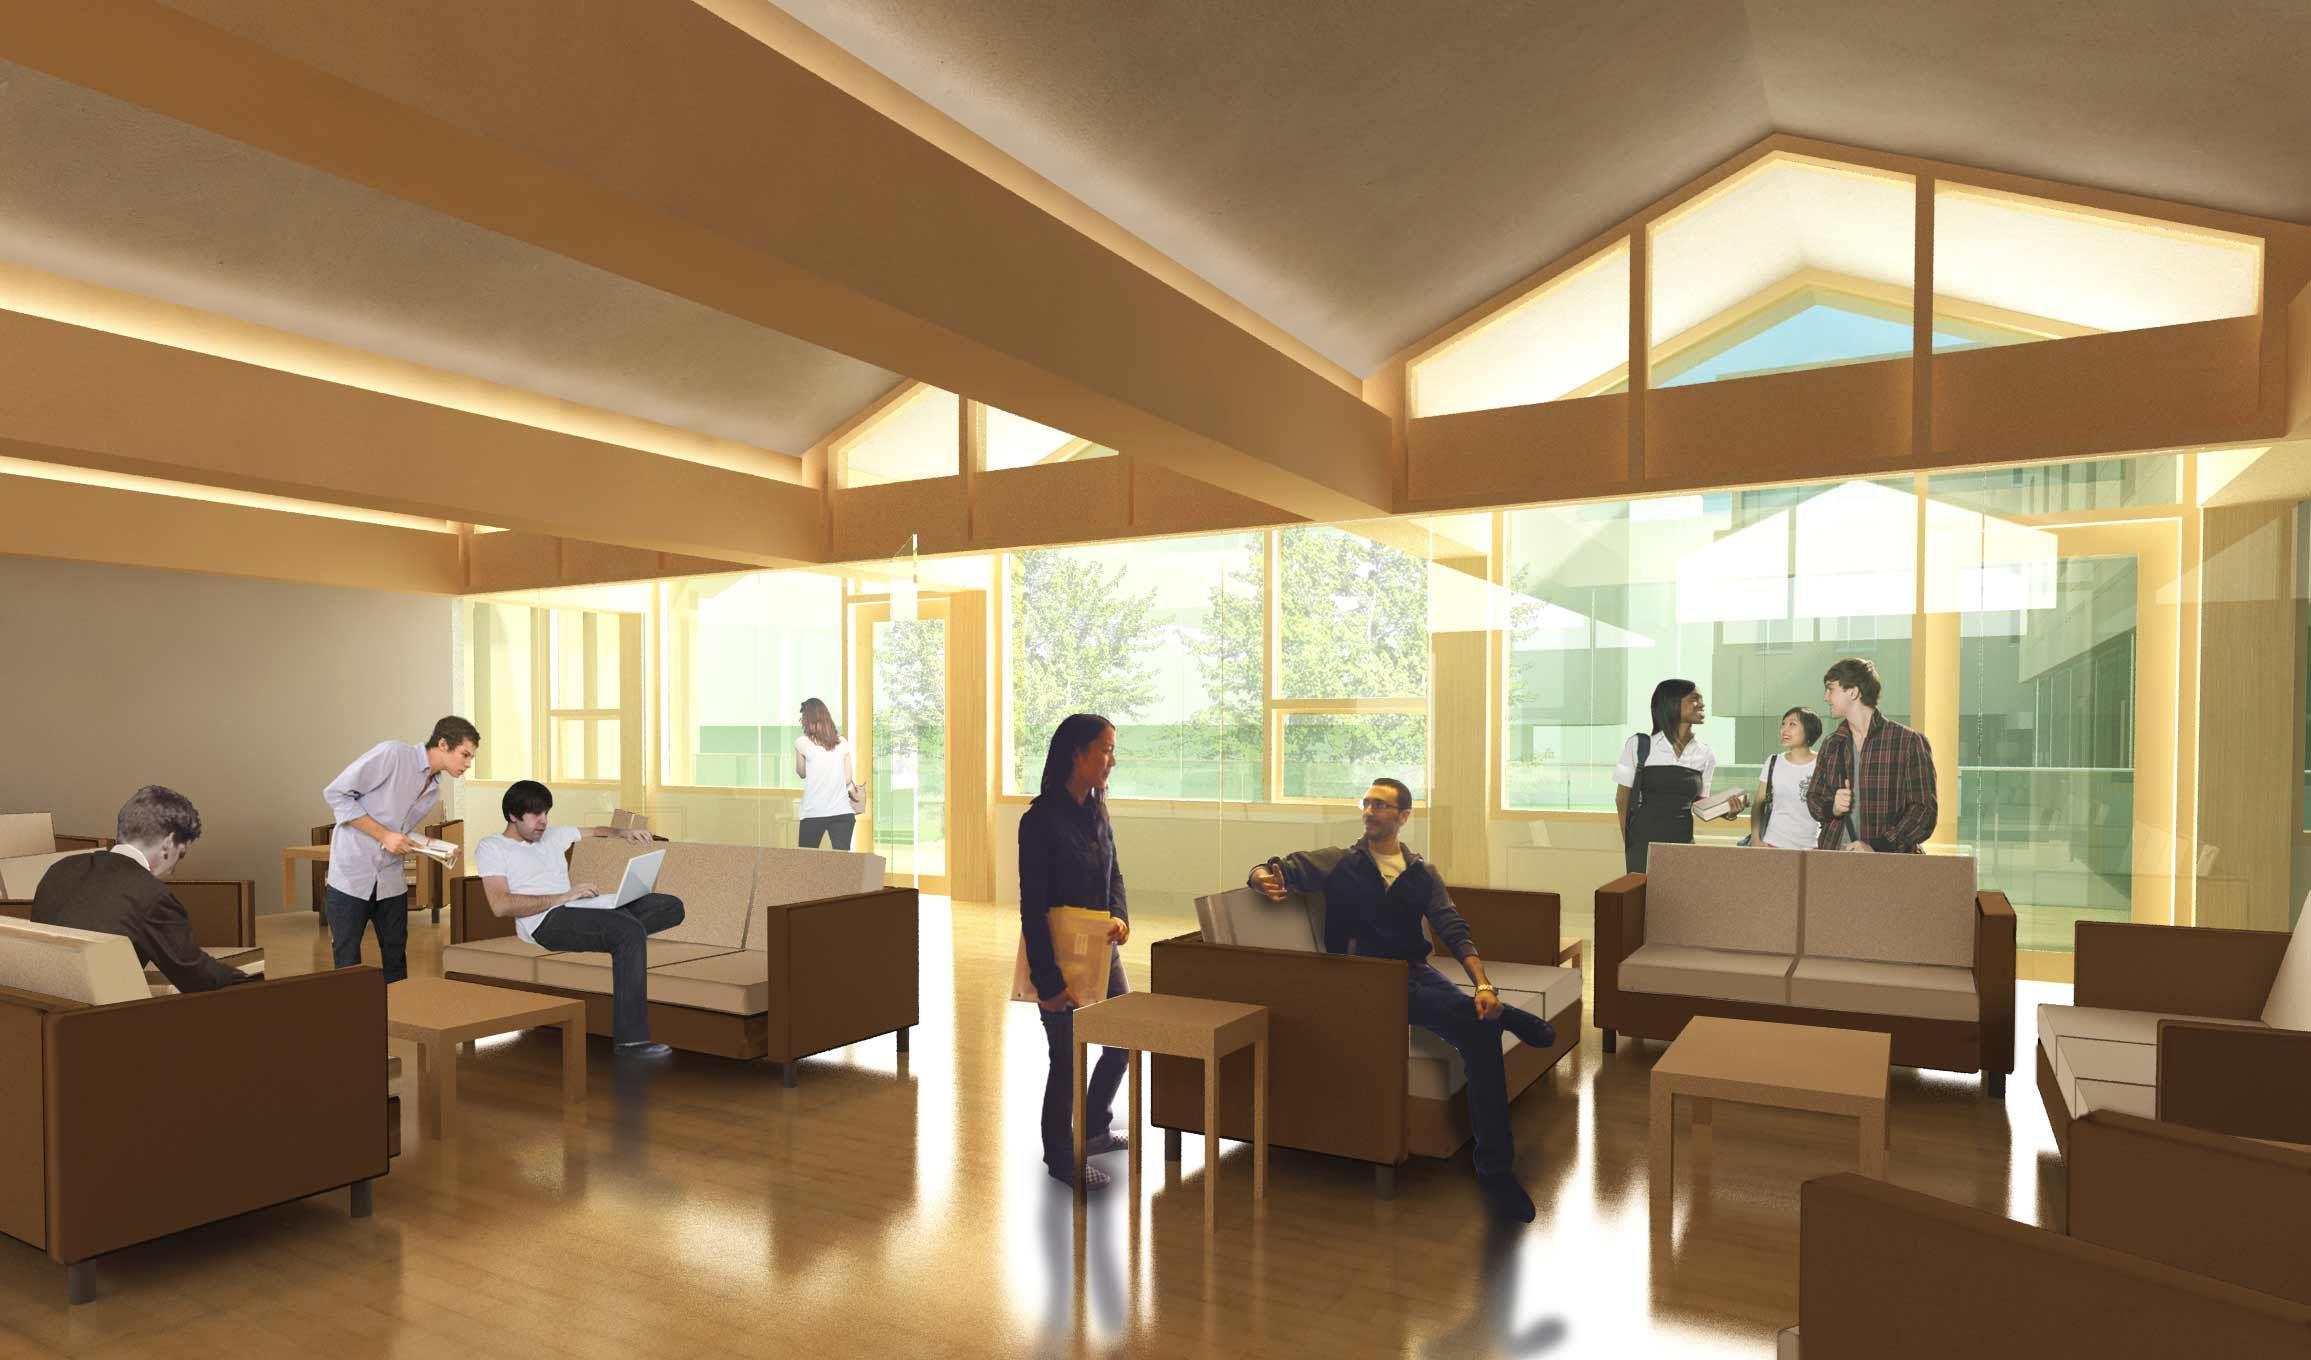 Victoria University Renovation By Moriyama And Teshima Of Original Building Eric Arthur More